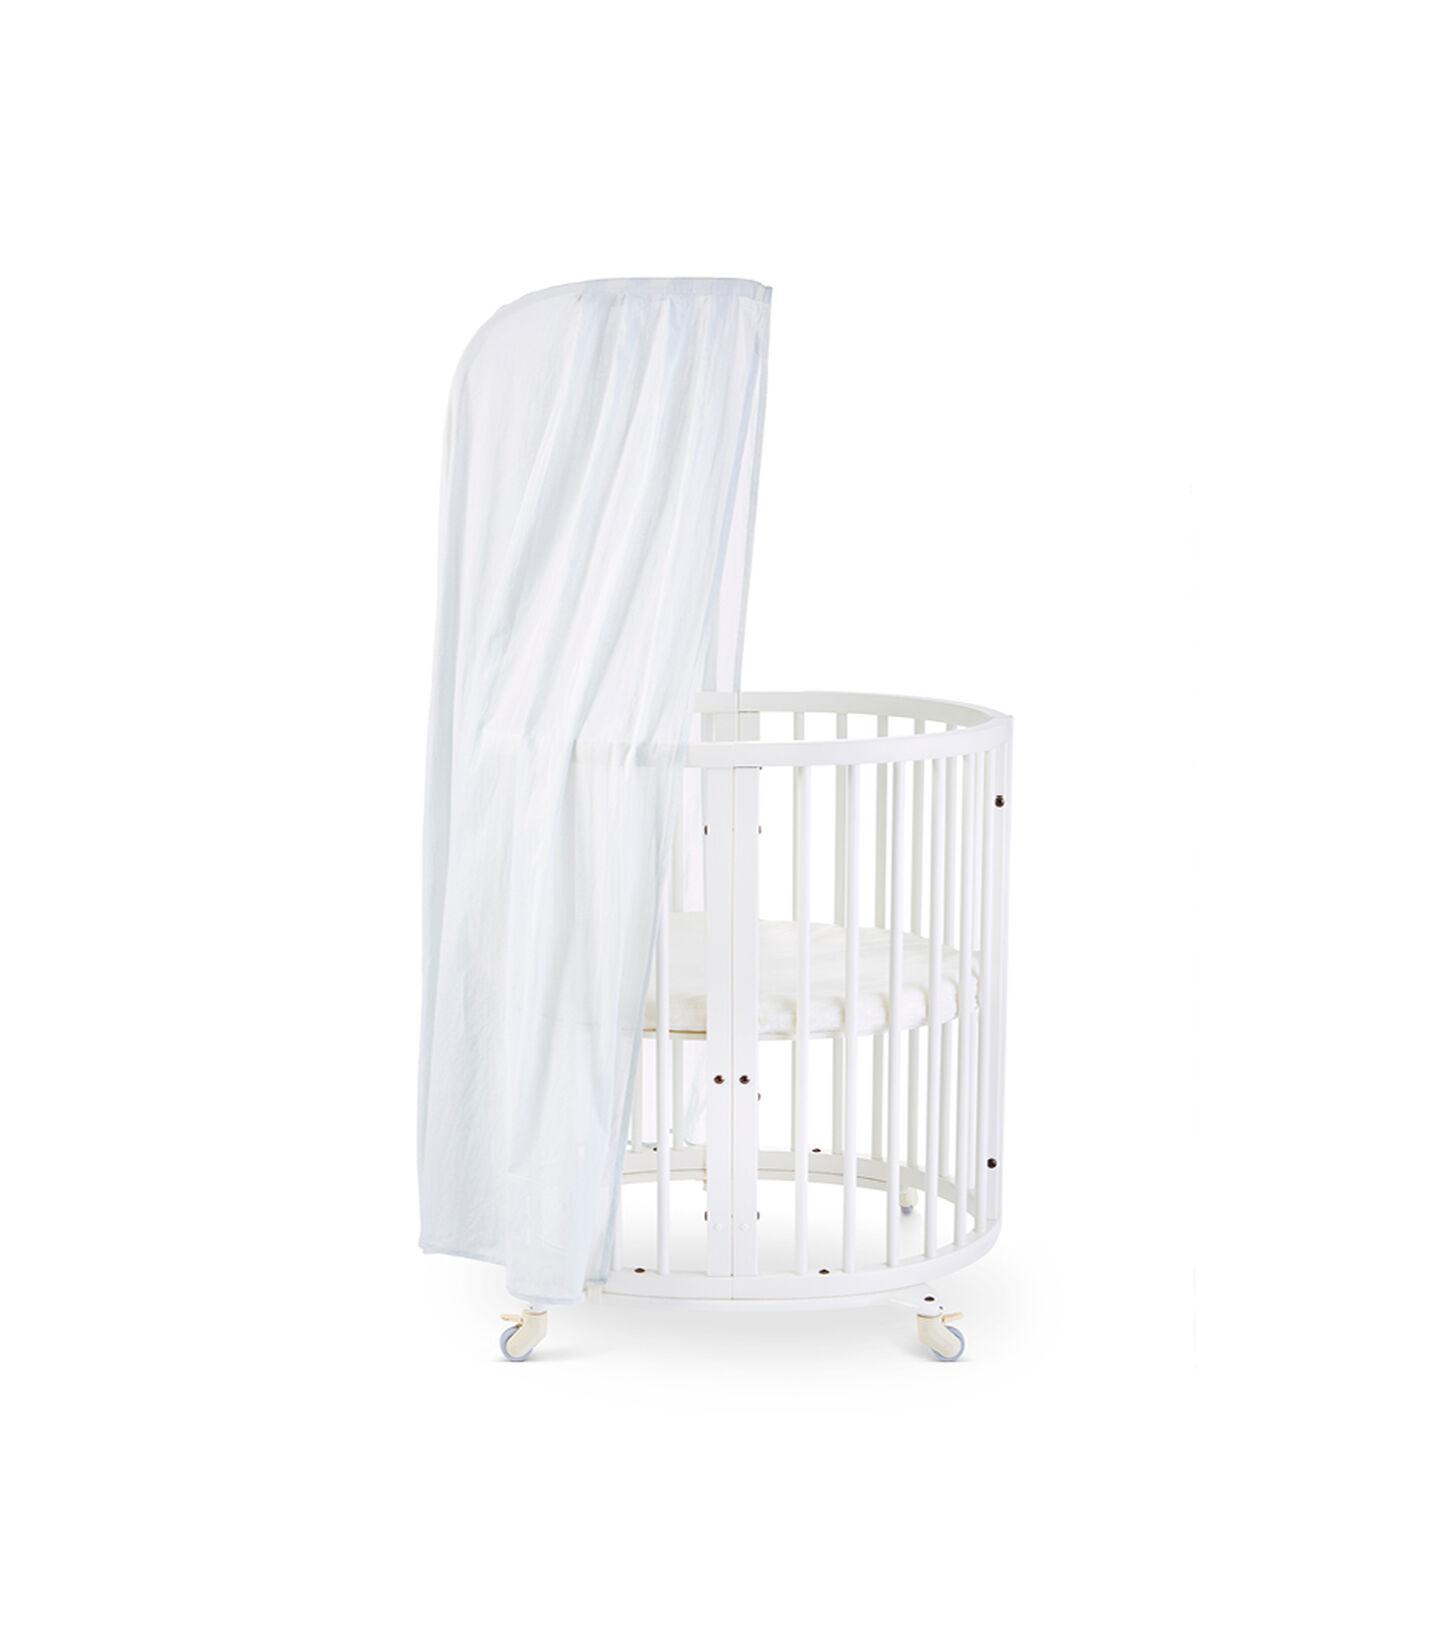 Stokke® Sleepi™ Canopy by Pehr Mist, Mist, mainview view 2